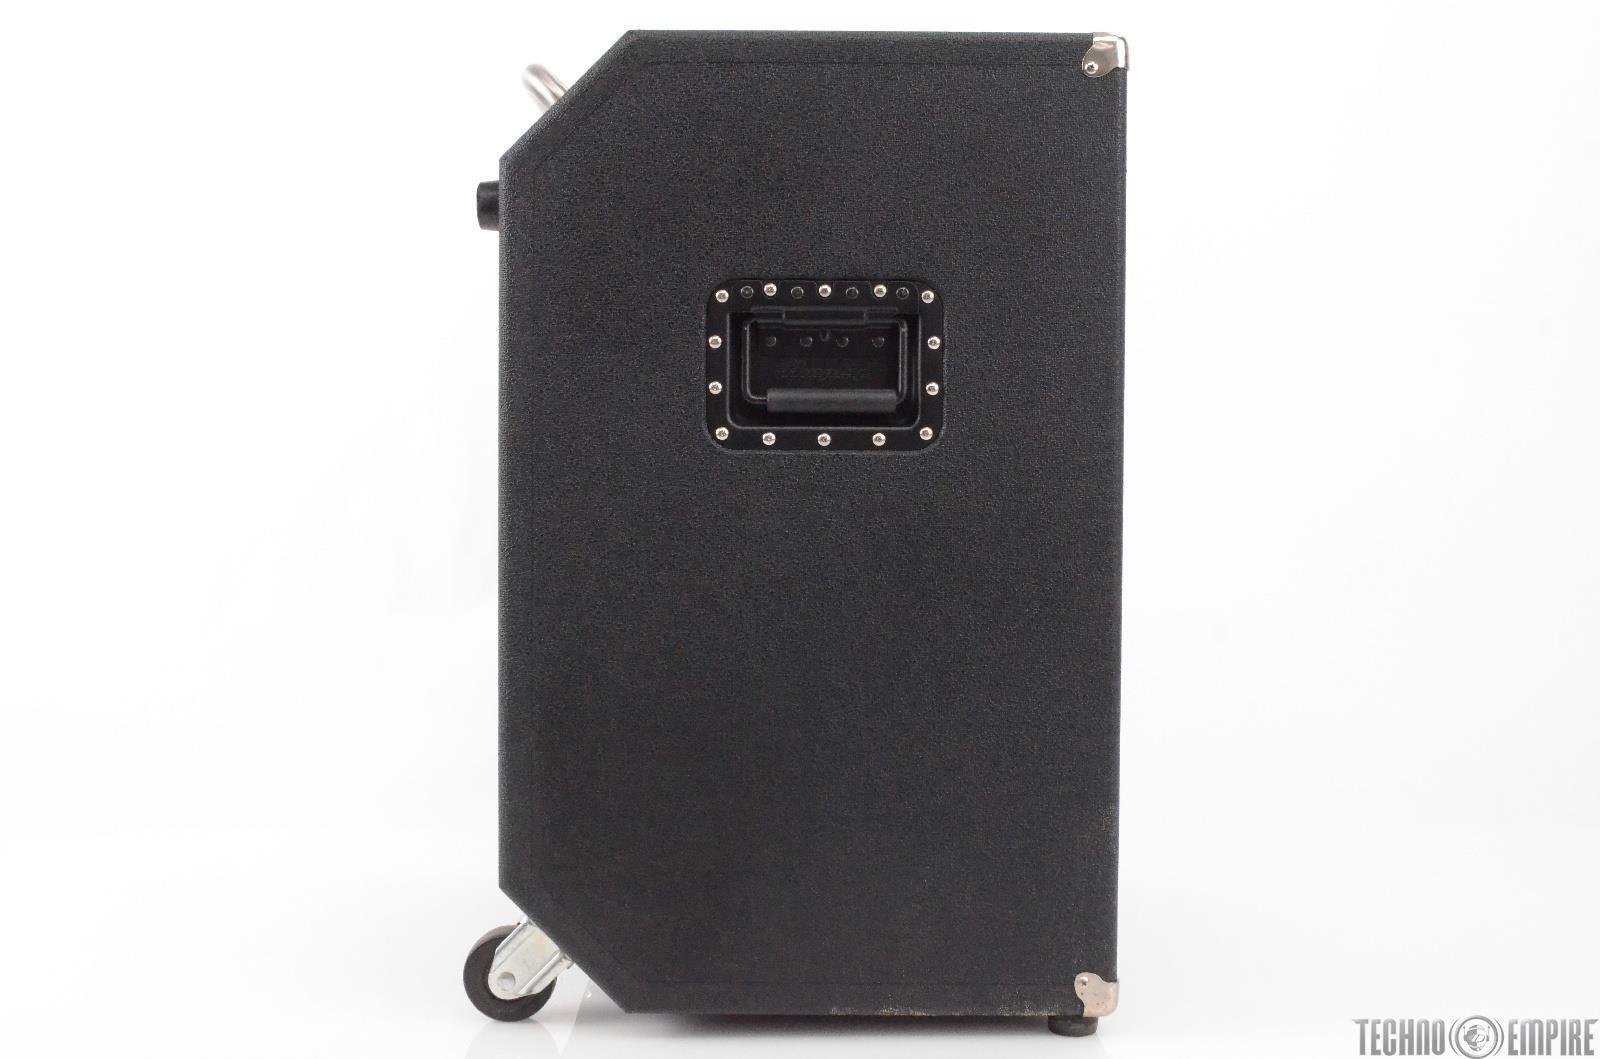 AMPEG SVT-410HLF 4x10 500W 4Ω Ohms Bass Cabinet #27943 . Techno Empire